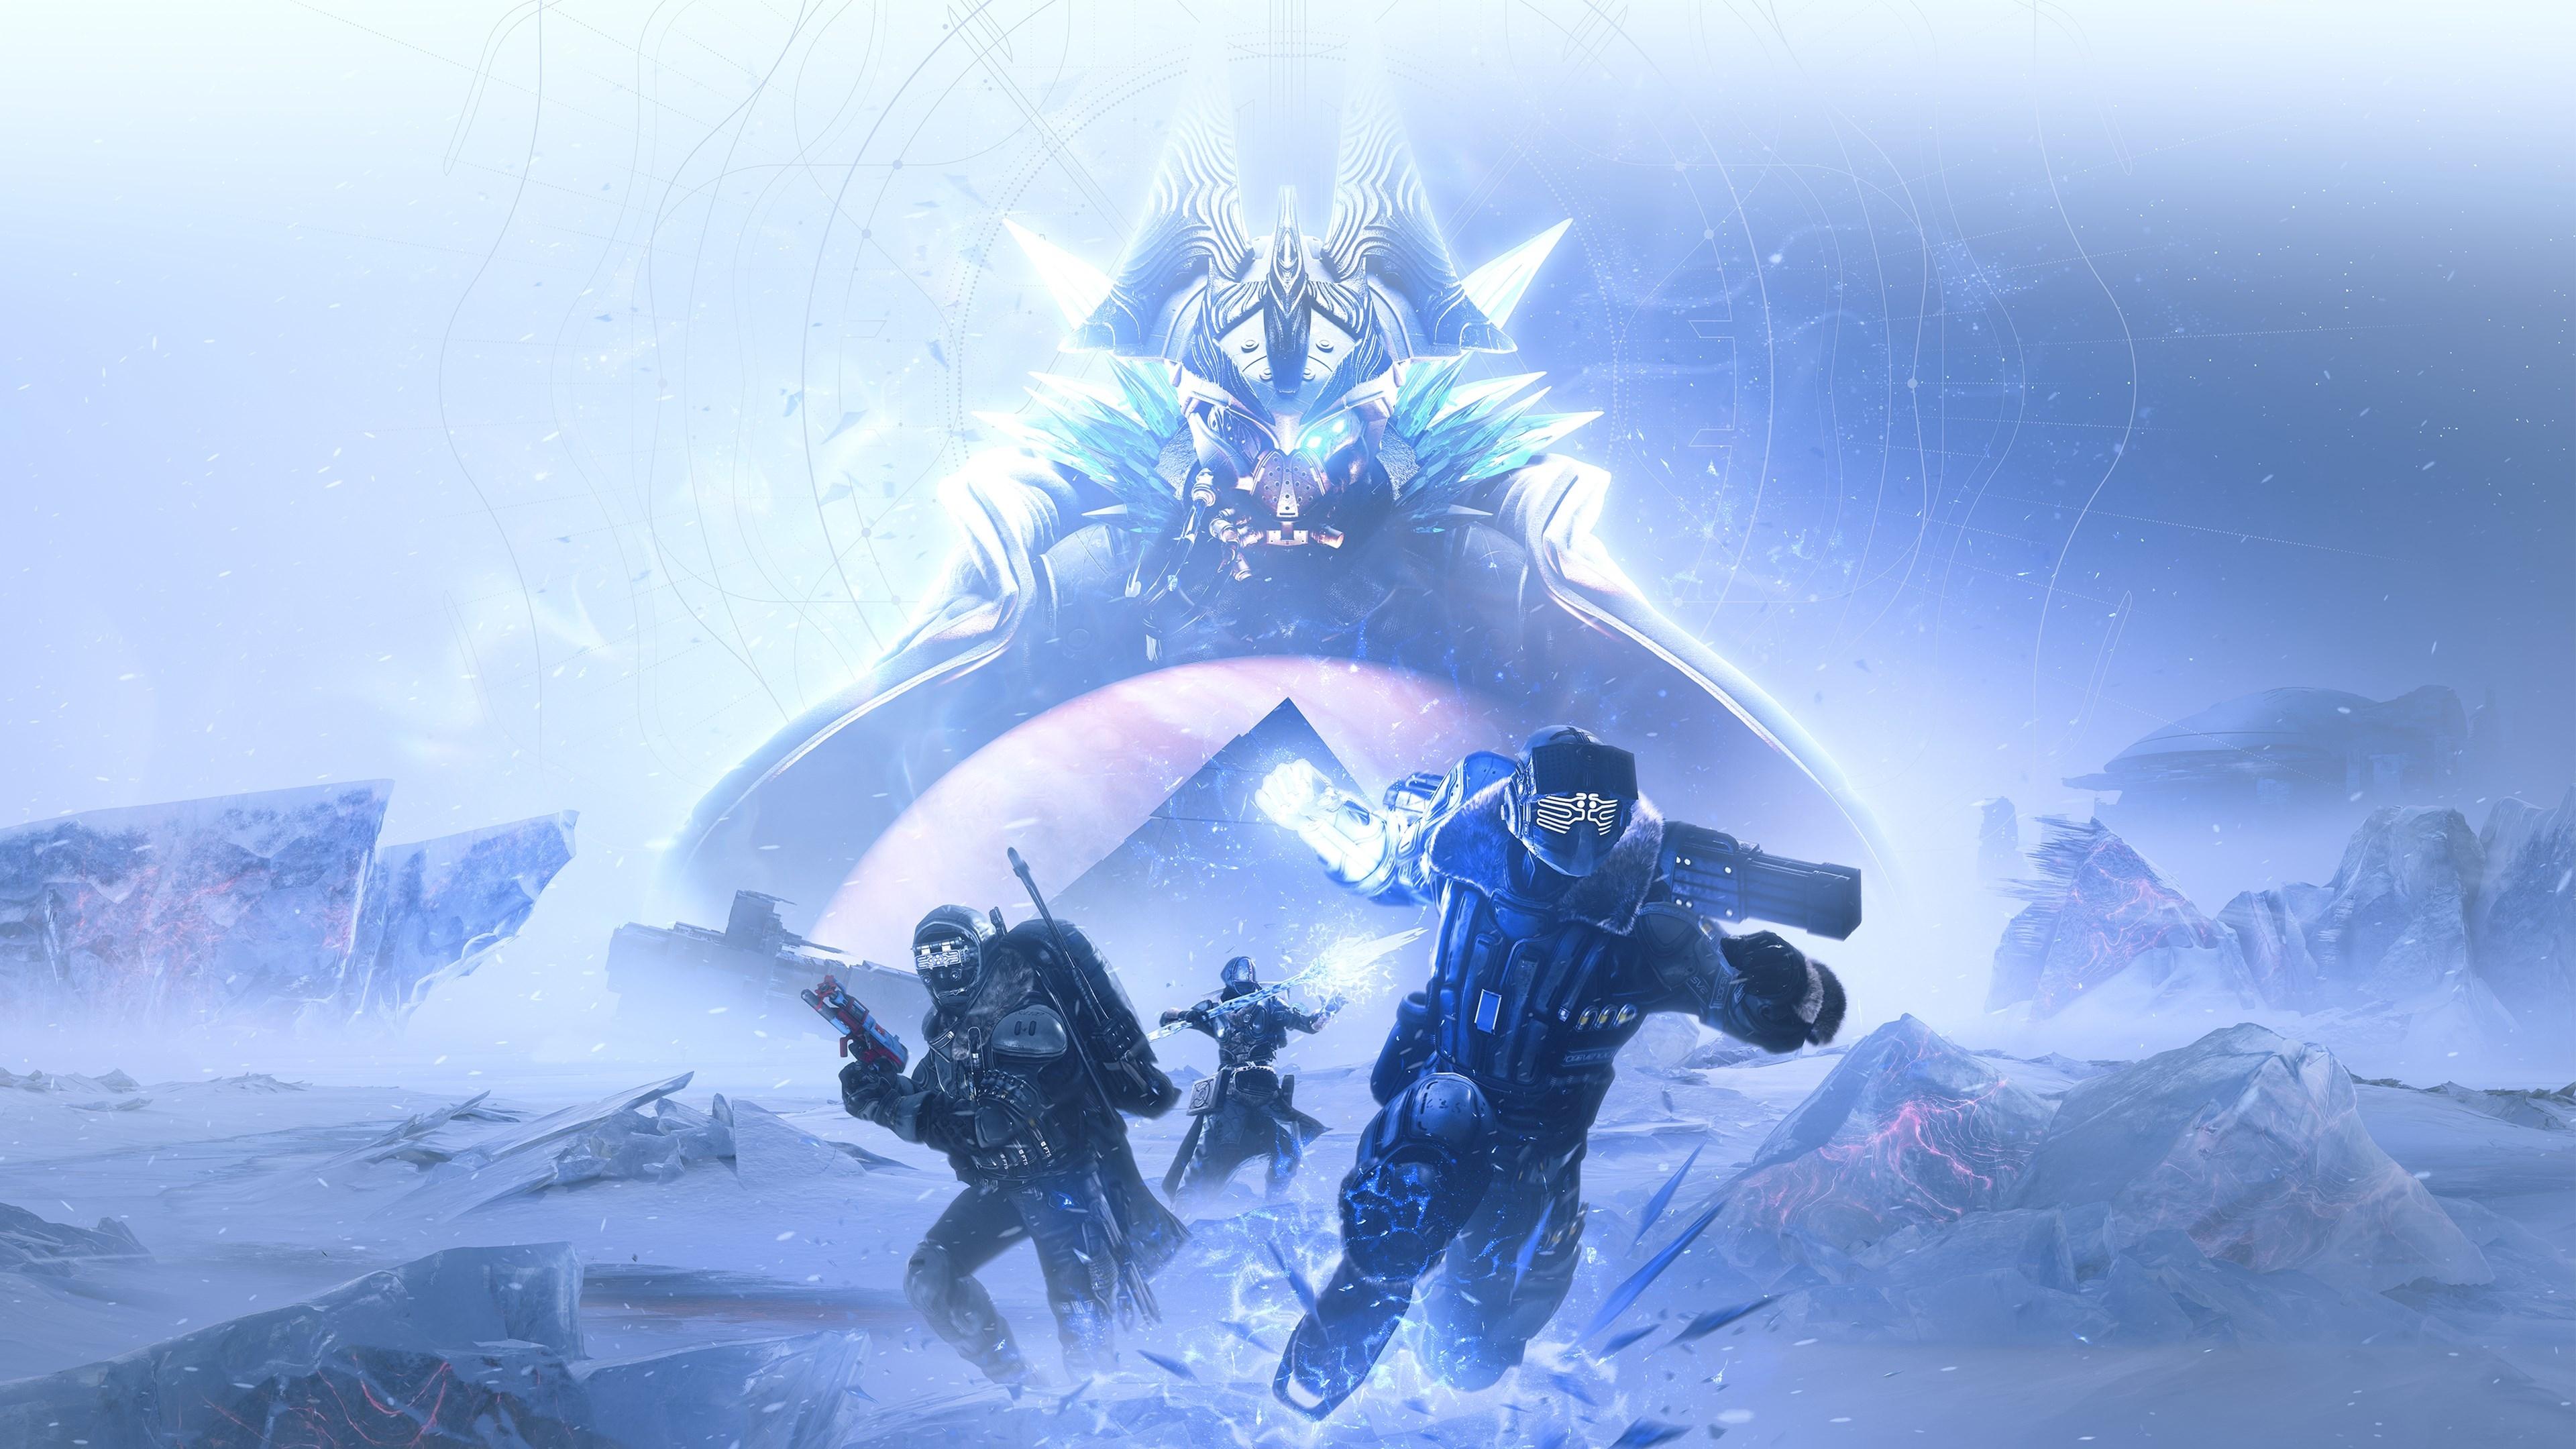 Destiny 2 Beyond Light 4K Wallpaper, HD Games 4K ...